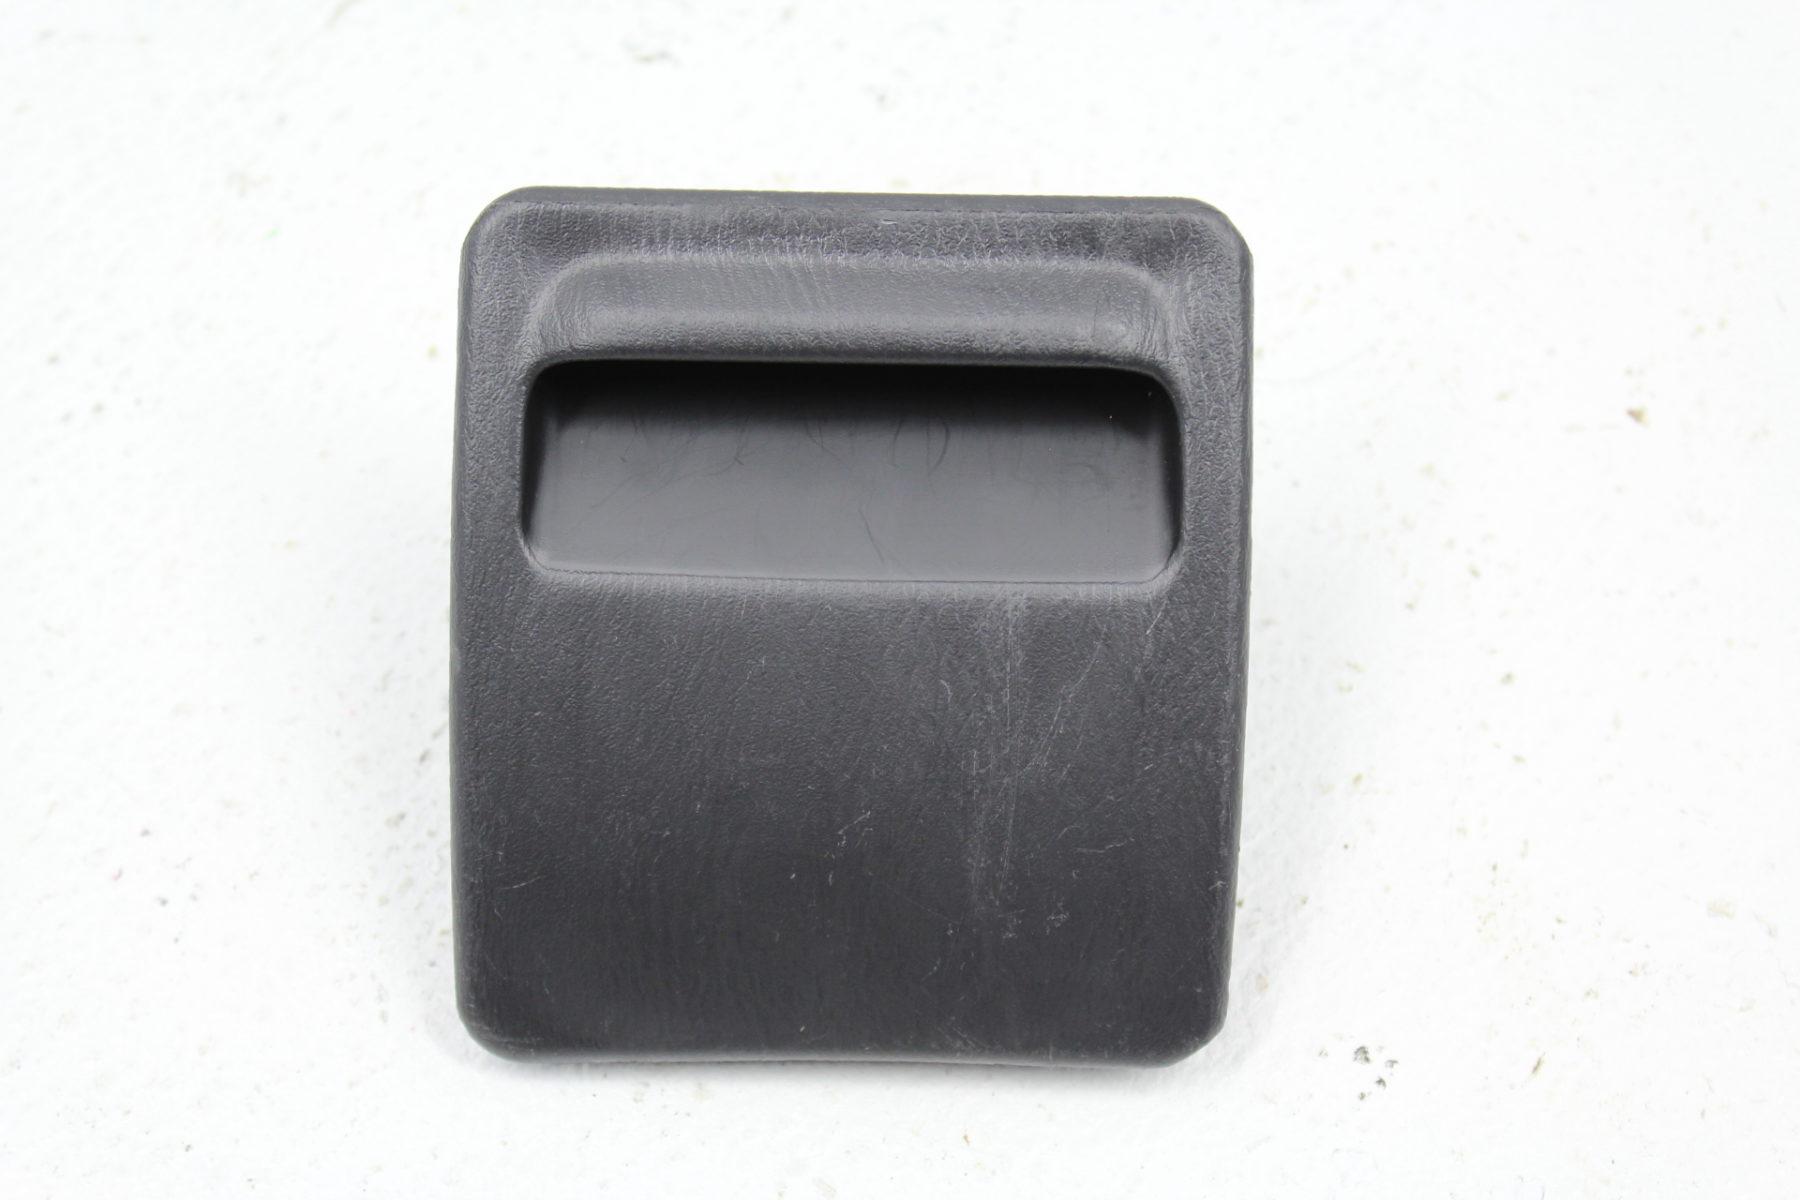 2007 subaru wrx fuse box 2004 2007 subaru wrx sti interior under dash fuse box cover panel  2004 2007 subaru wrx sti interior under